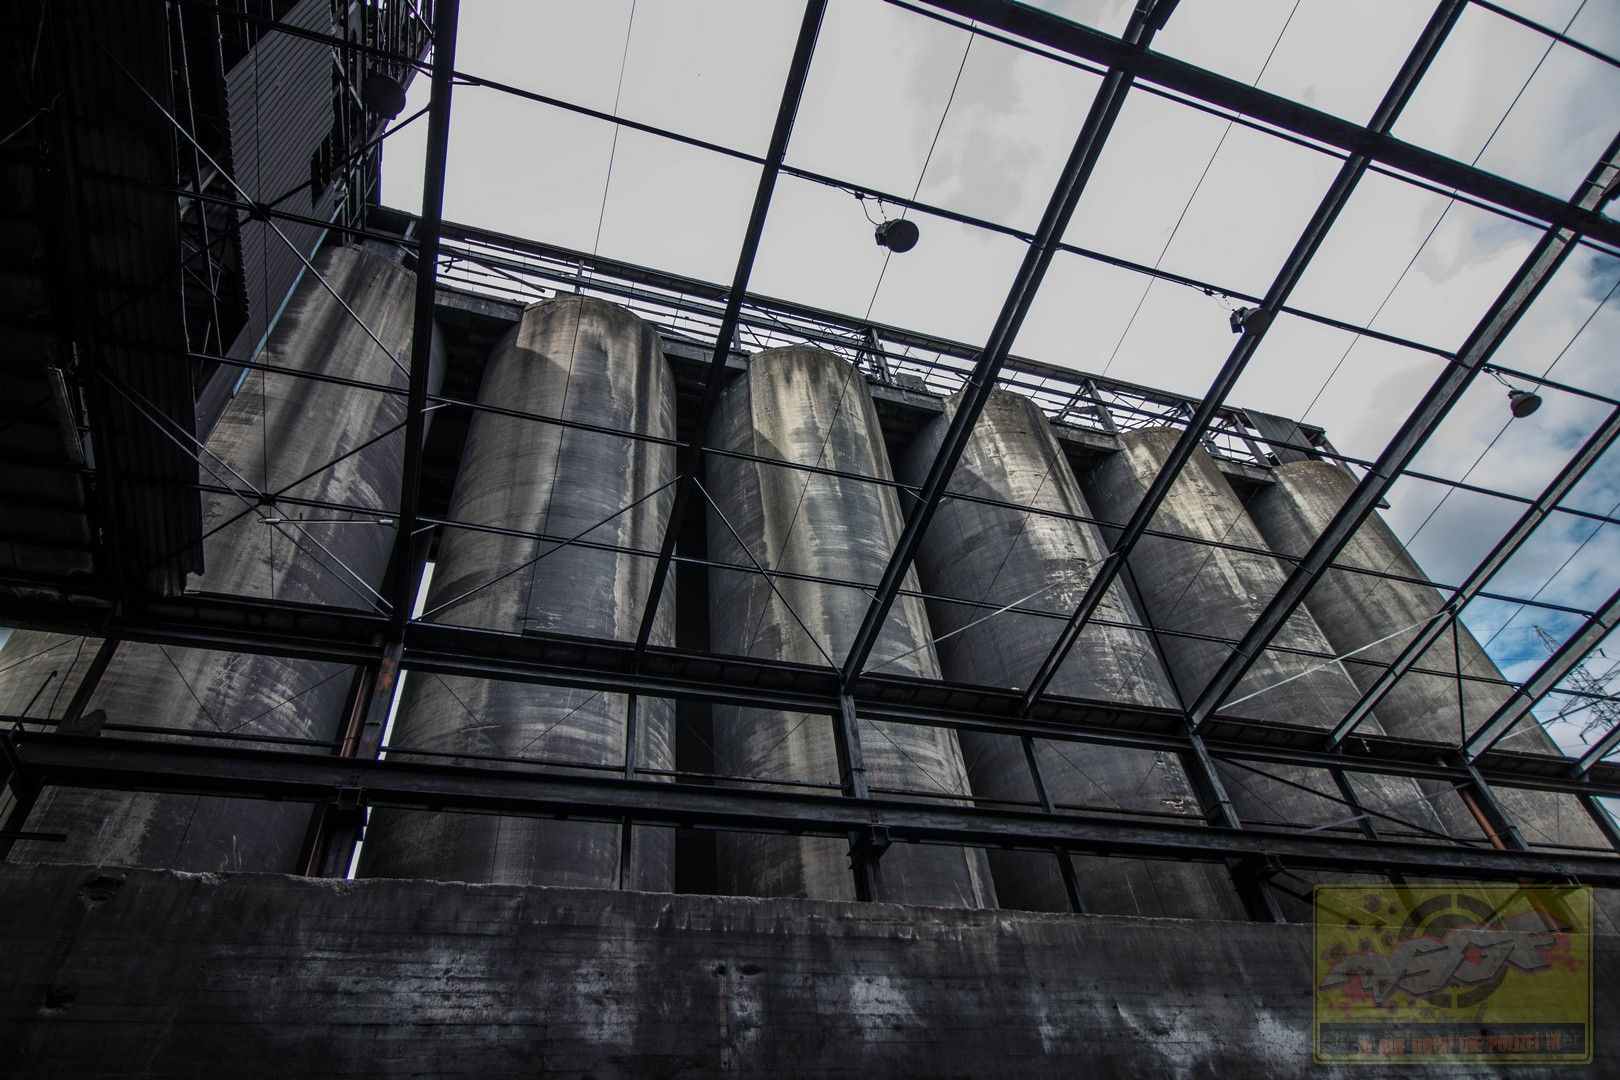 Bauxitfabrik-27.06.2020-6